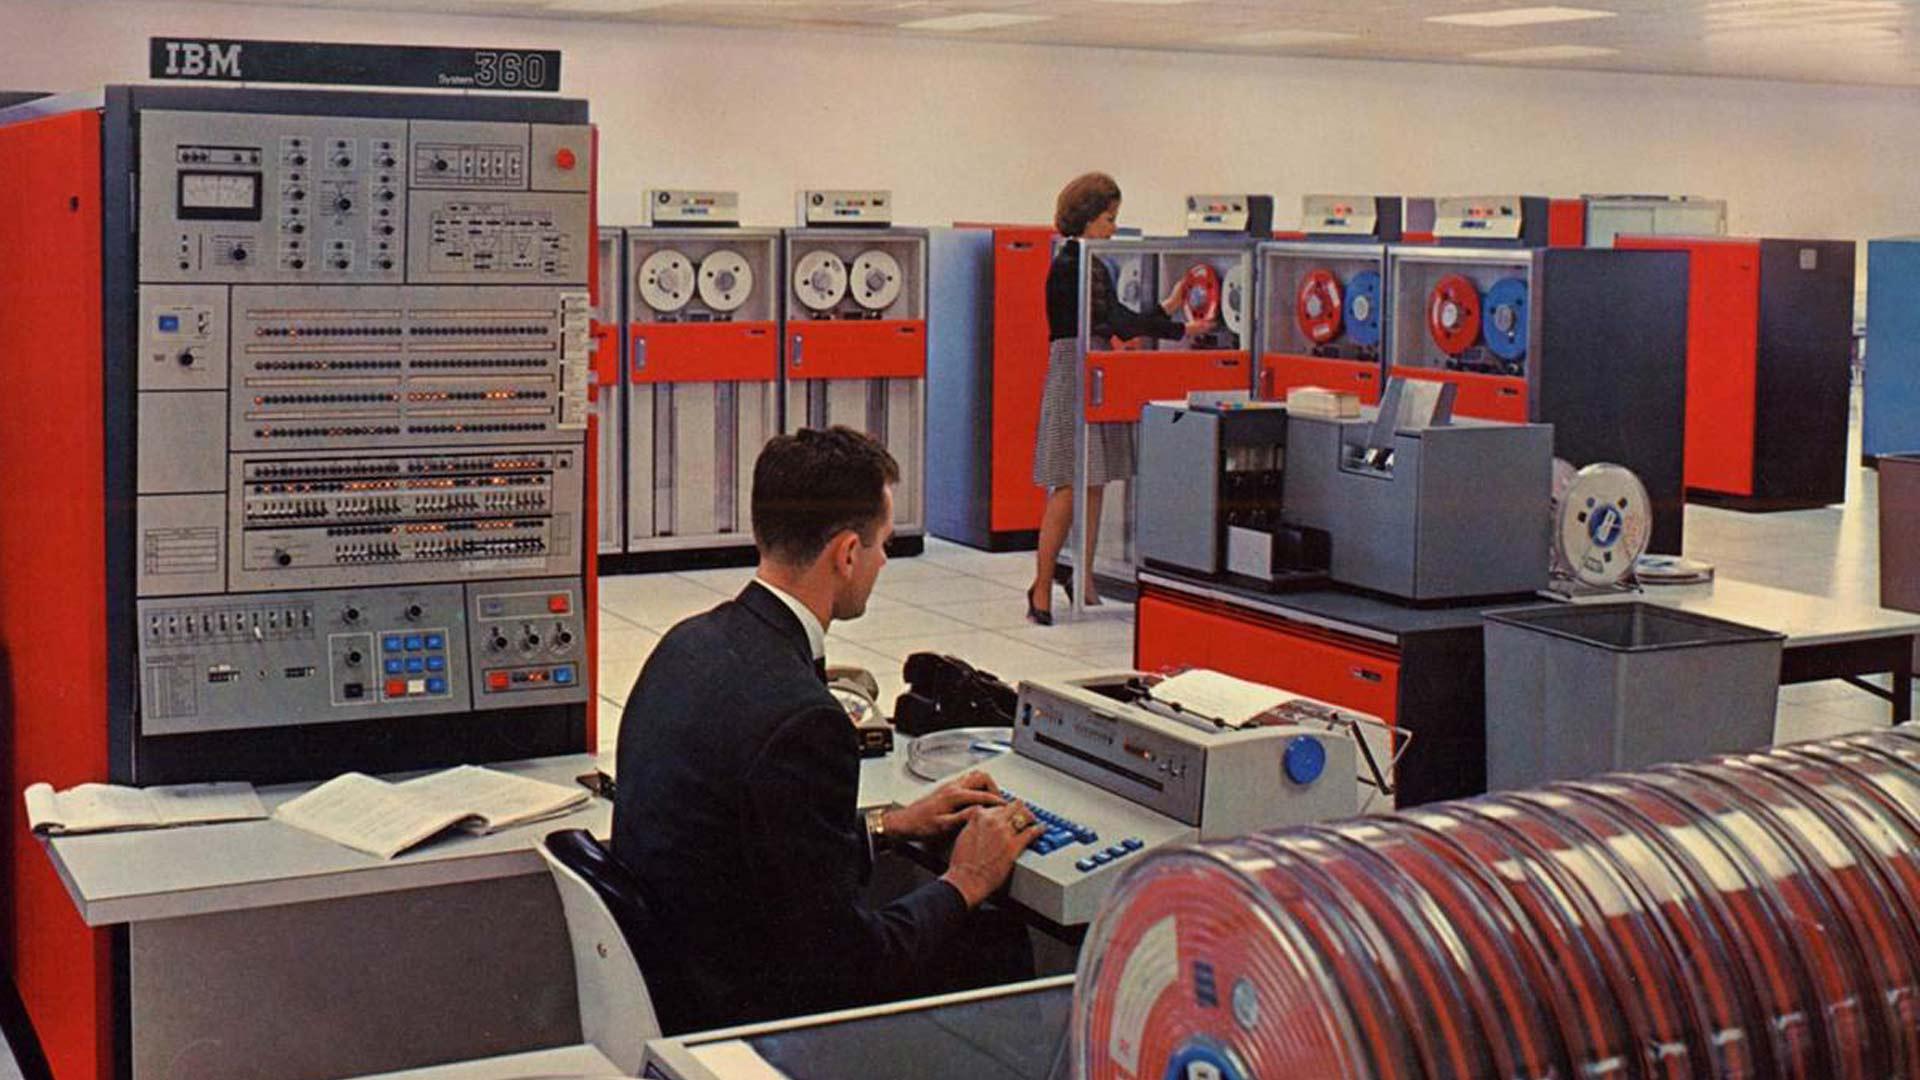 big-old-computer.jpg